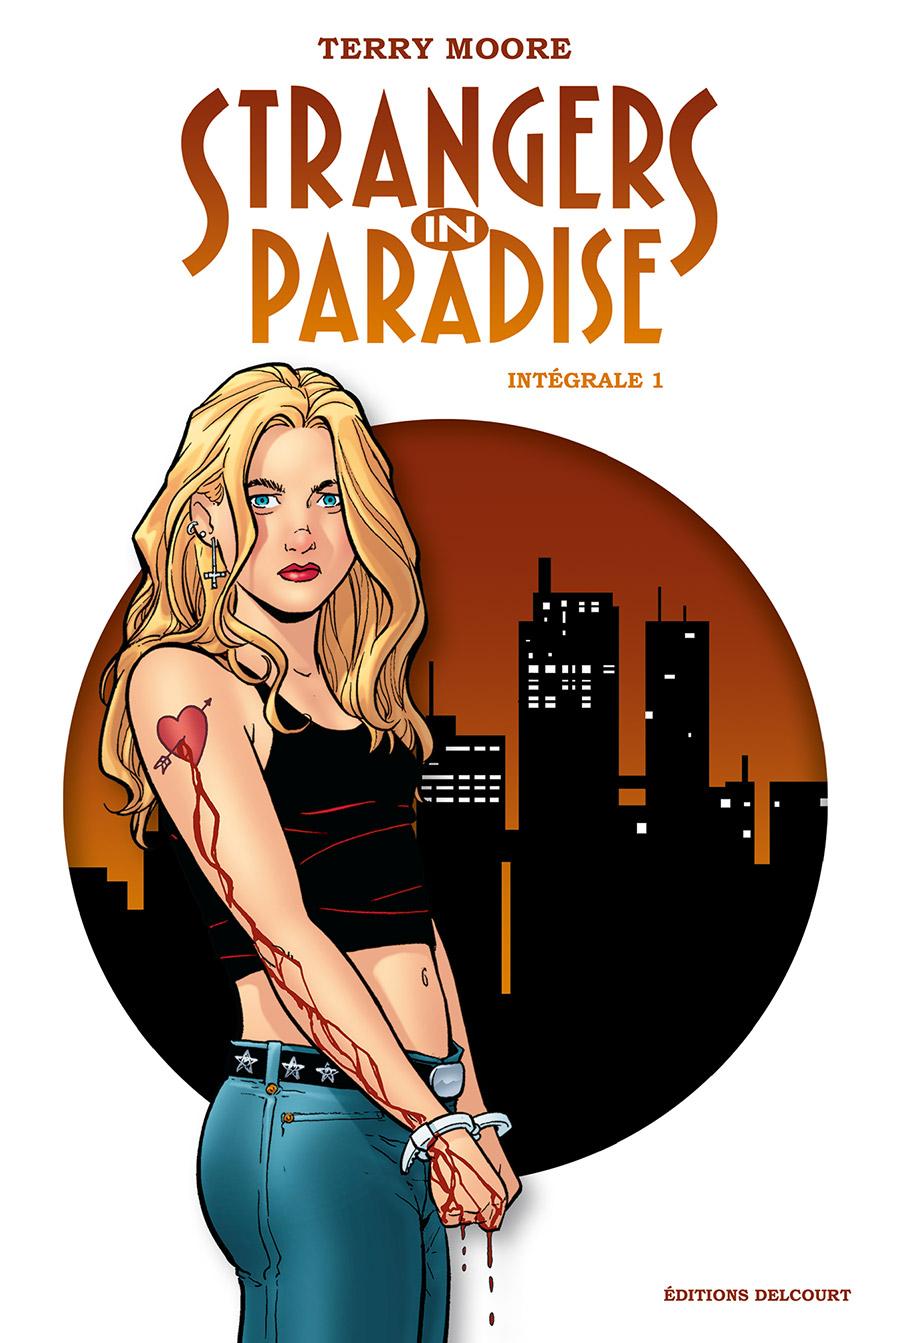 Strangers In Paradise, par Terry Moore, intégrale 1